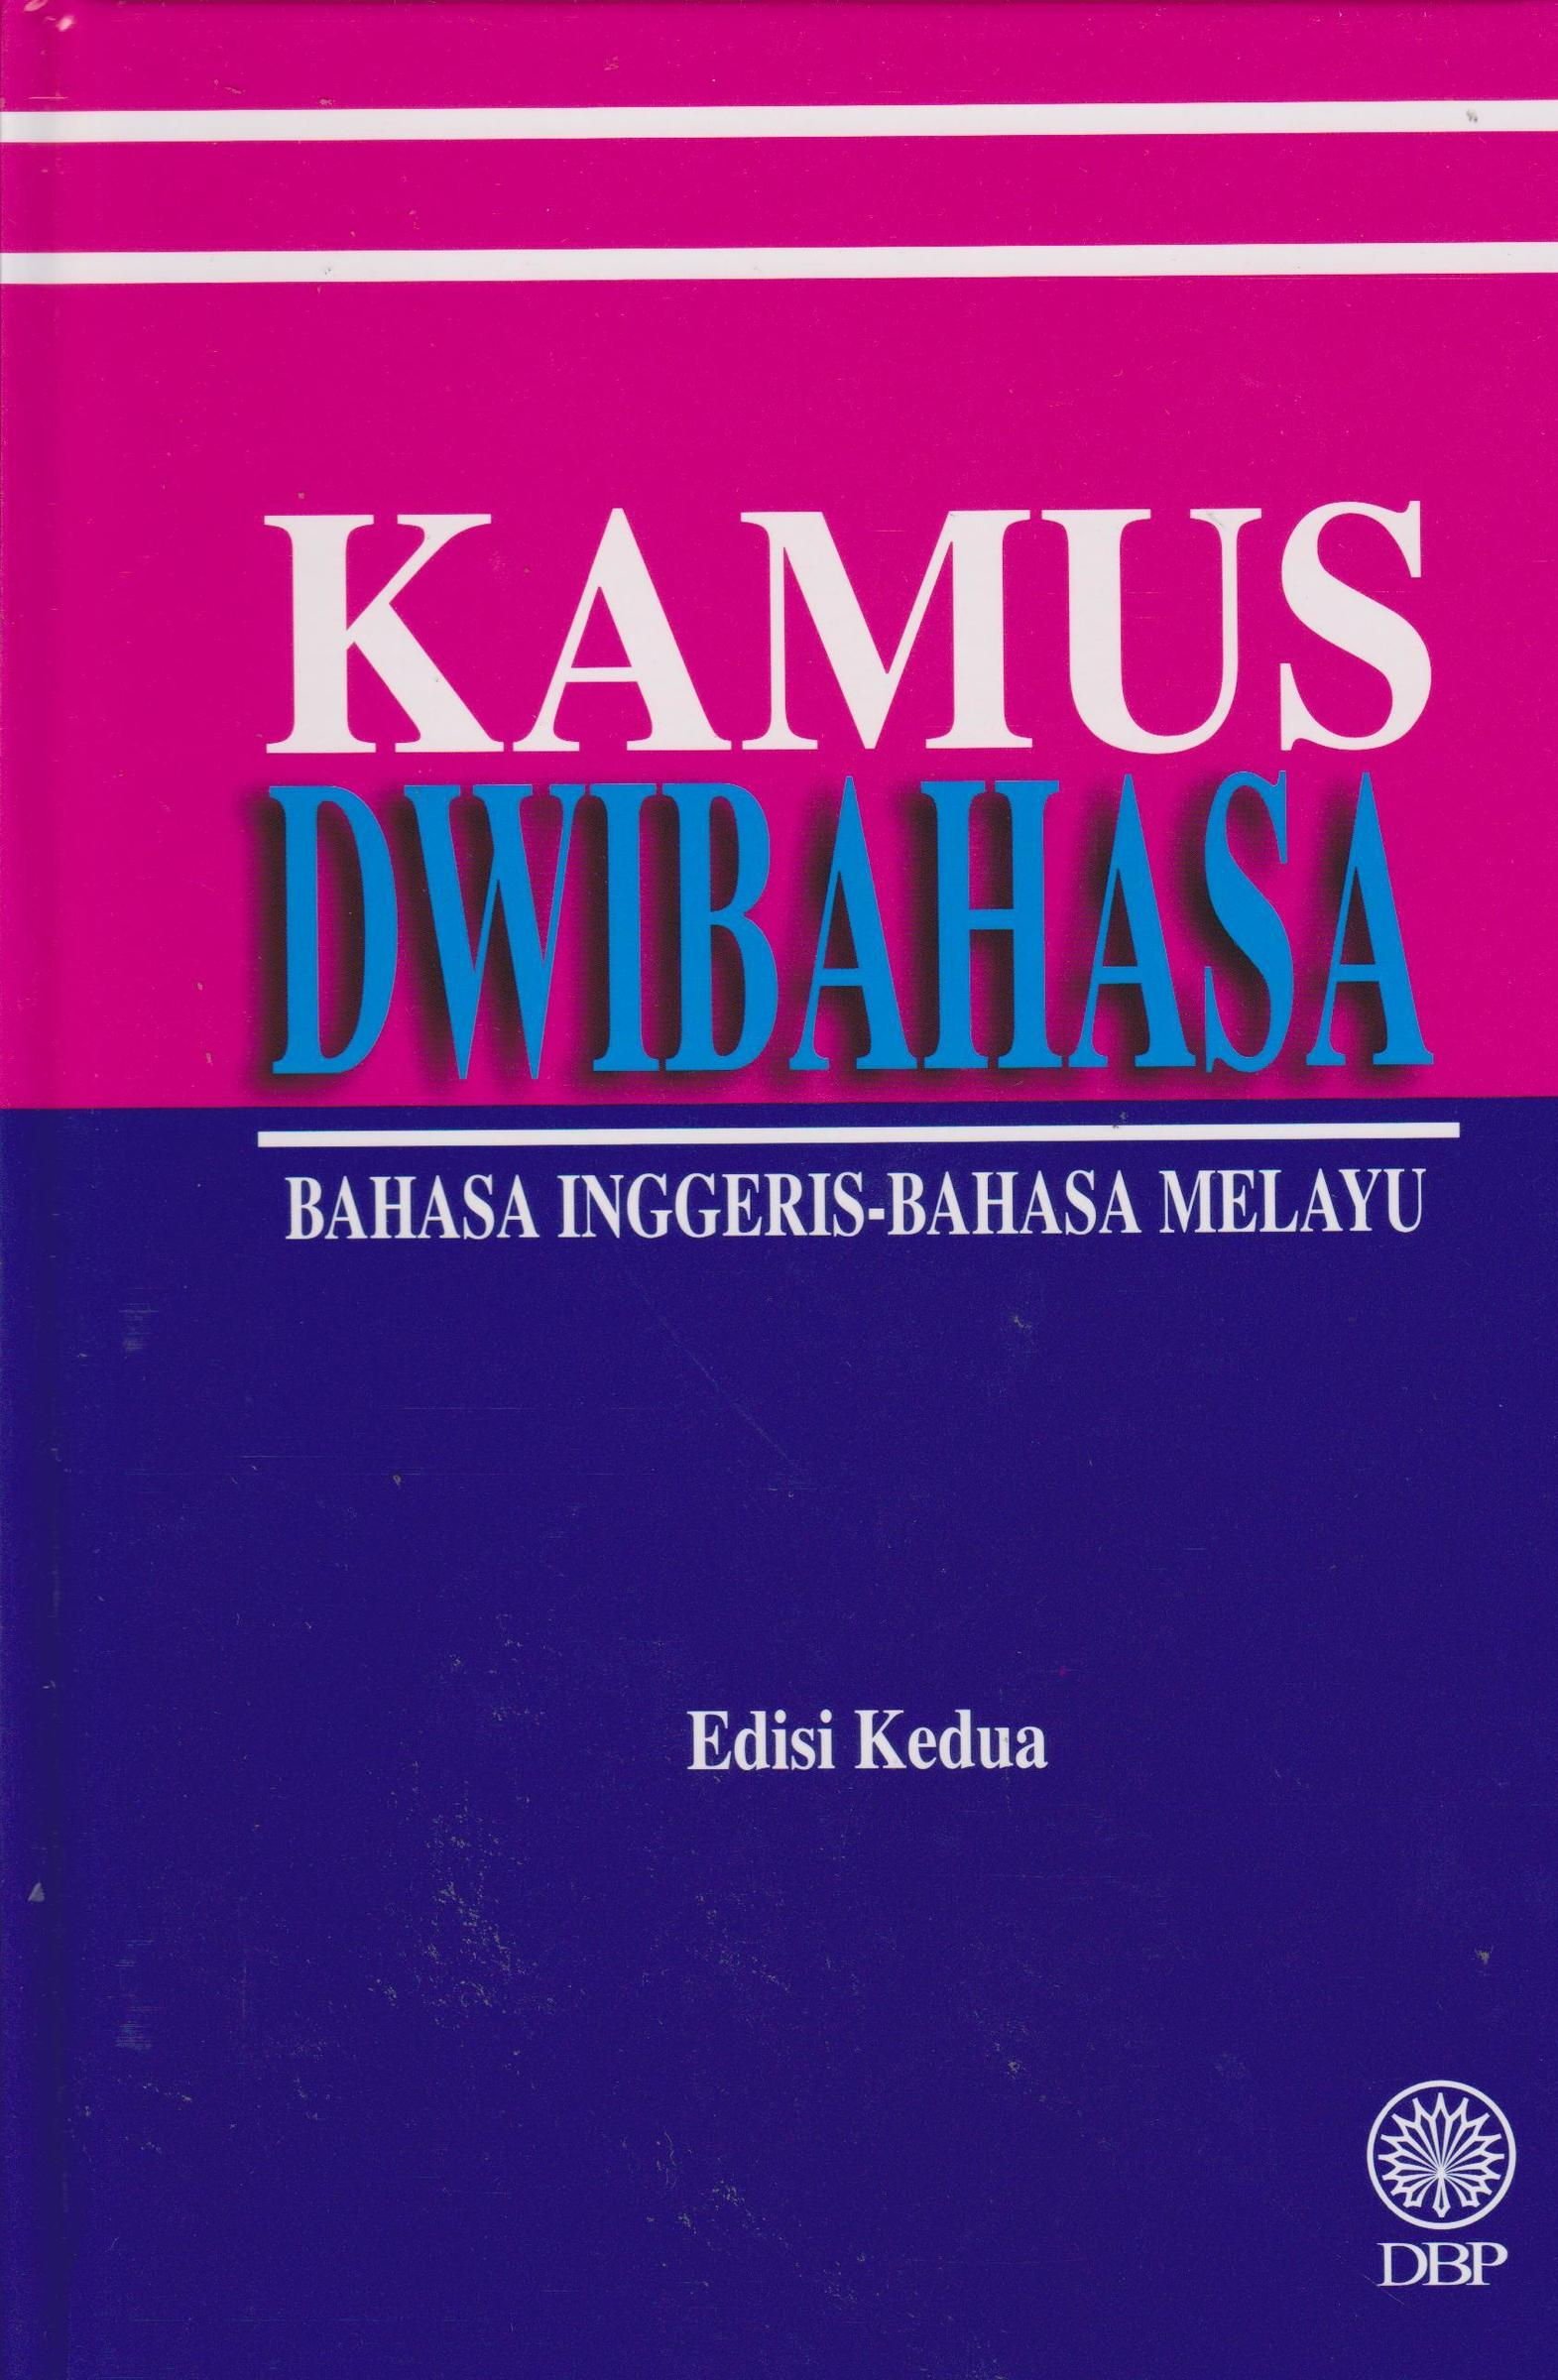 Kamus Dwibahasa Bahasa Inggeris Bahasa Melayu Pustaka Mukmin Kl Malaysia S Online Bookstore